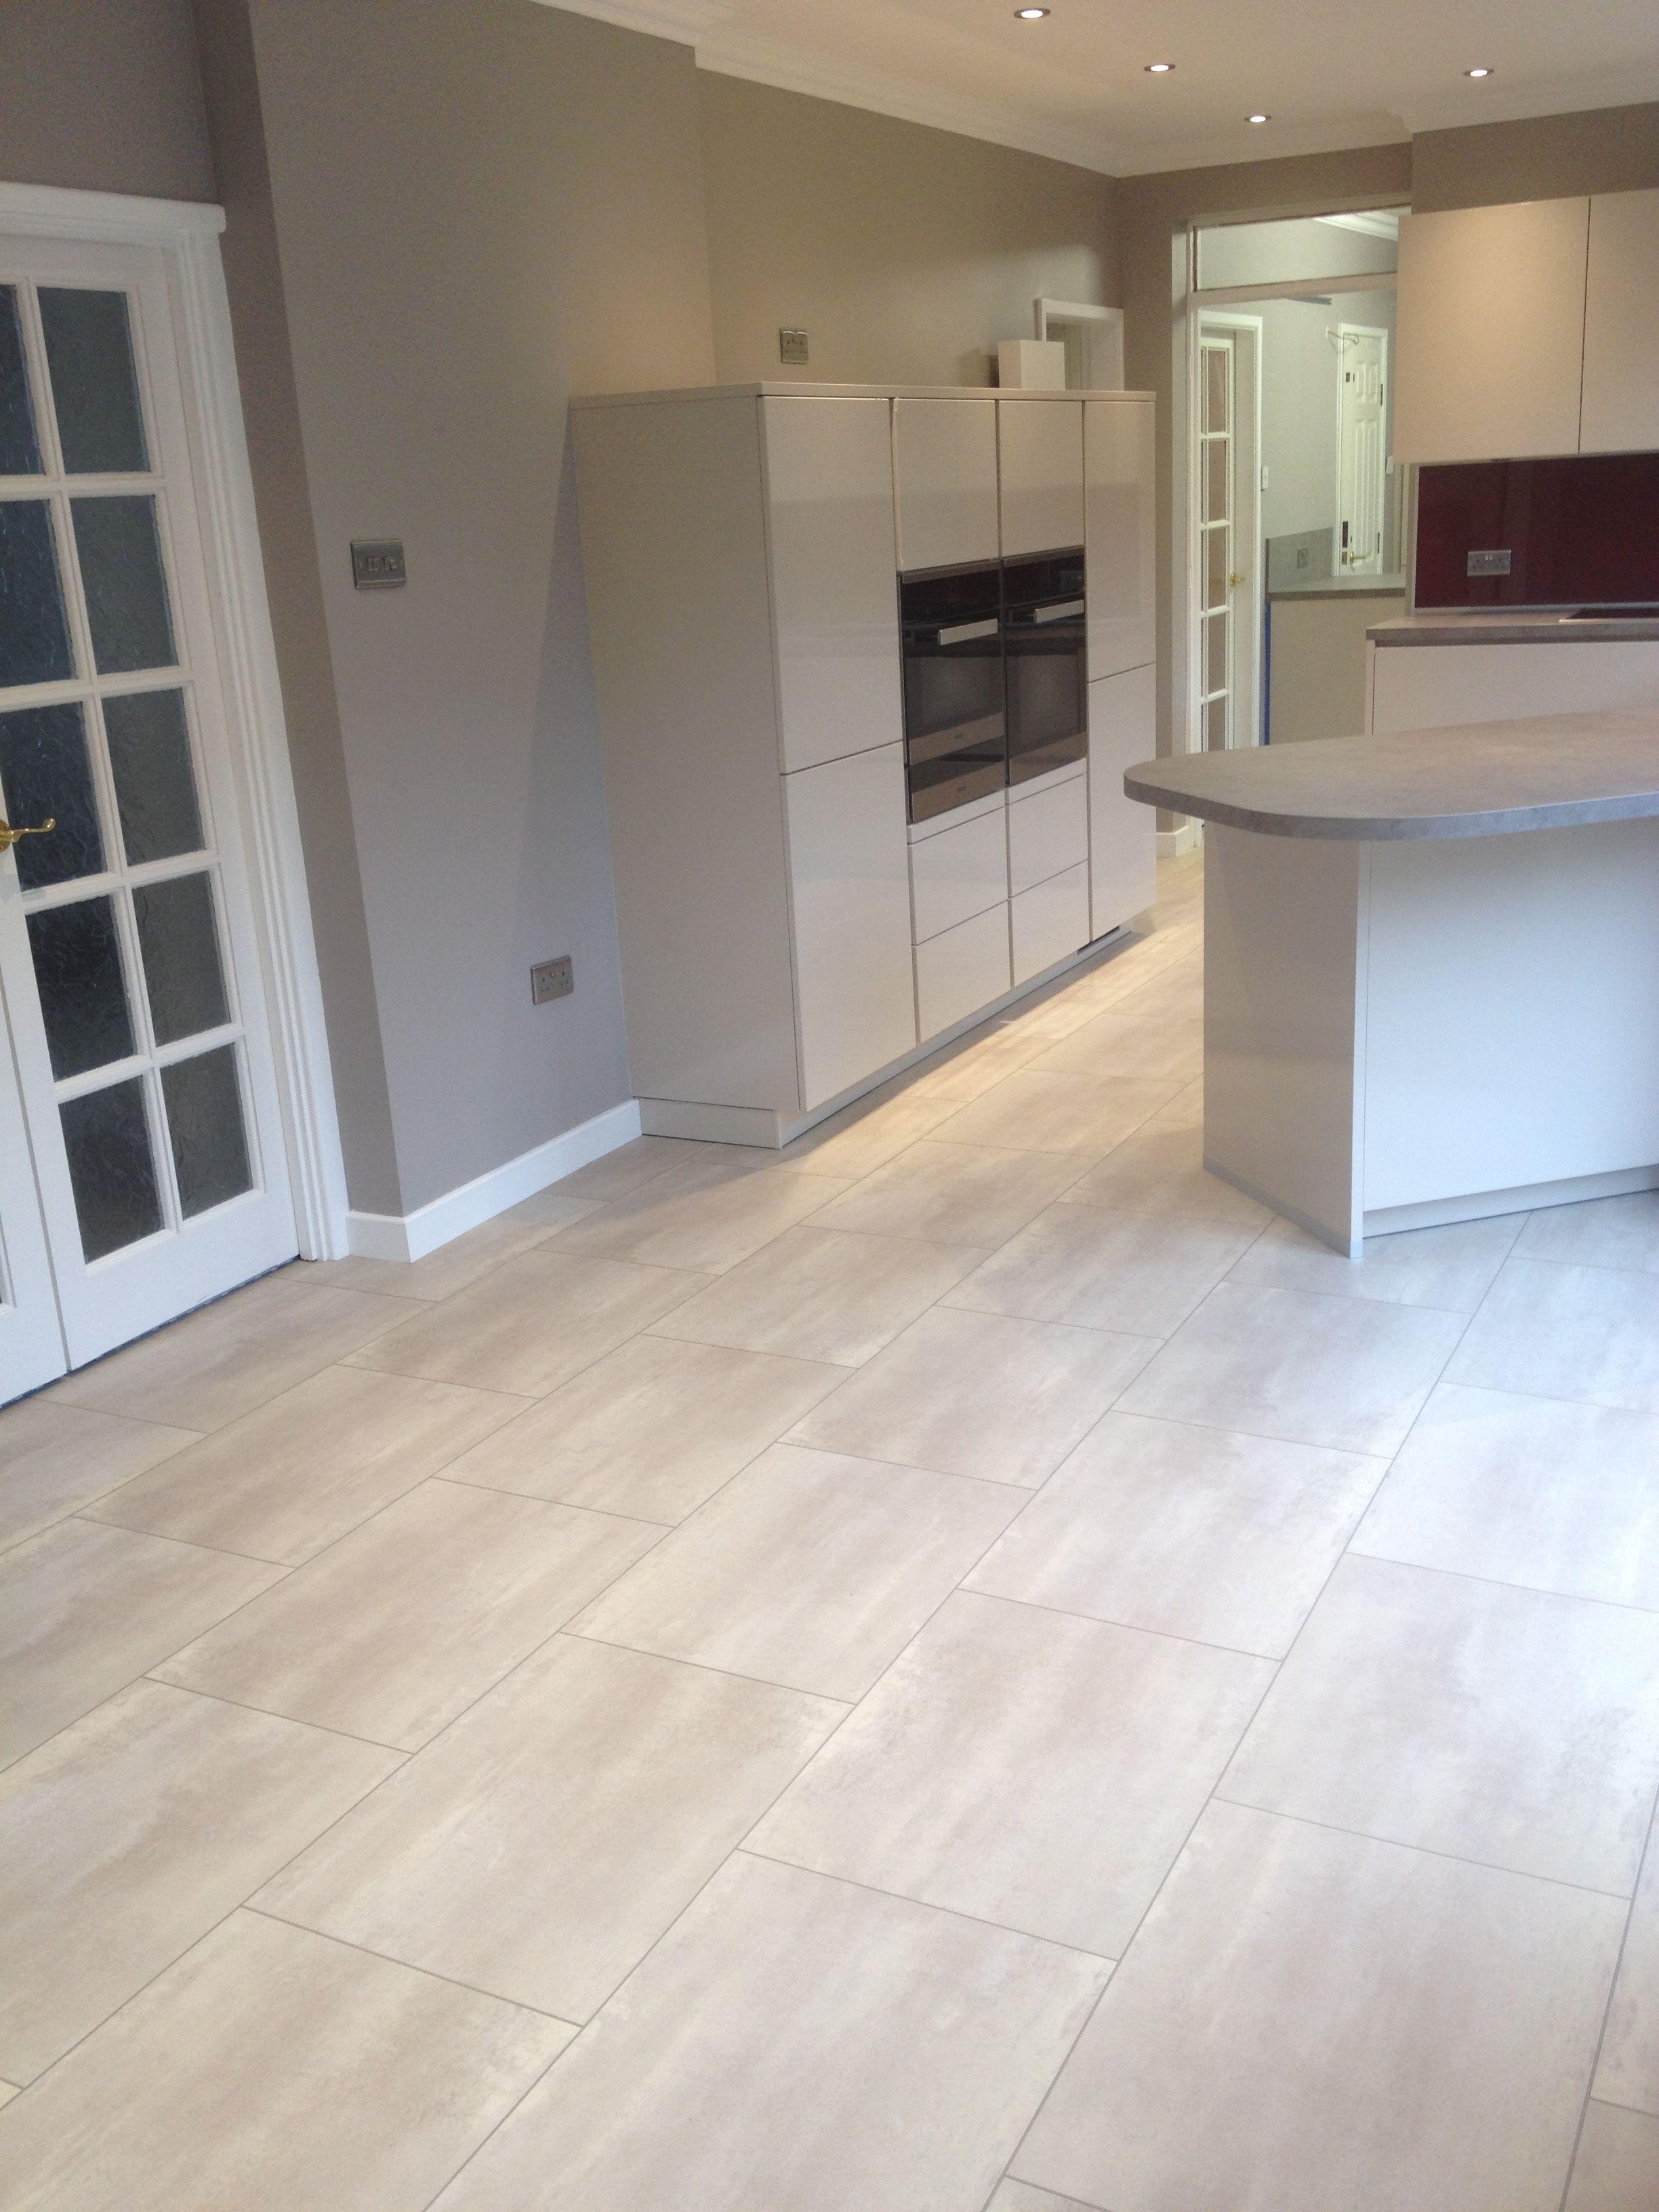 Karndean Opus flooring installed by us the large tiles